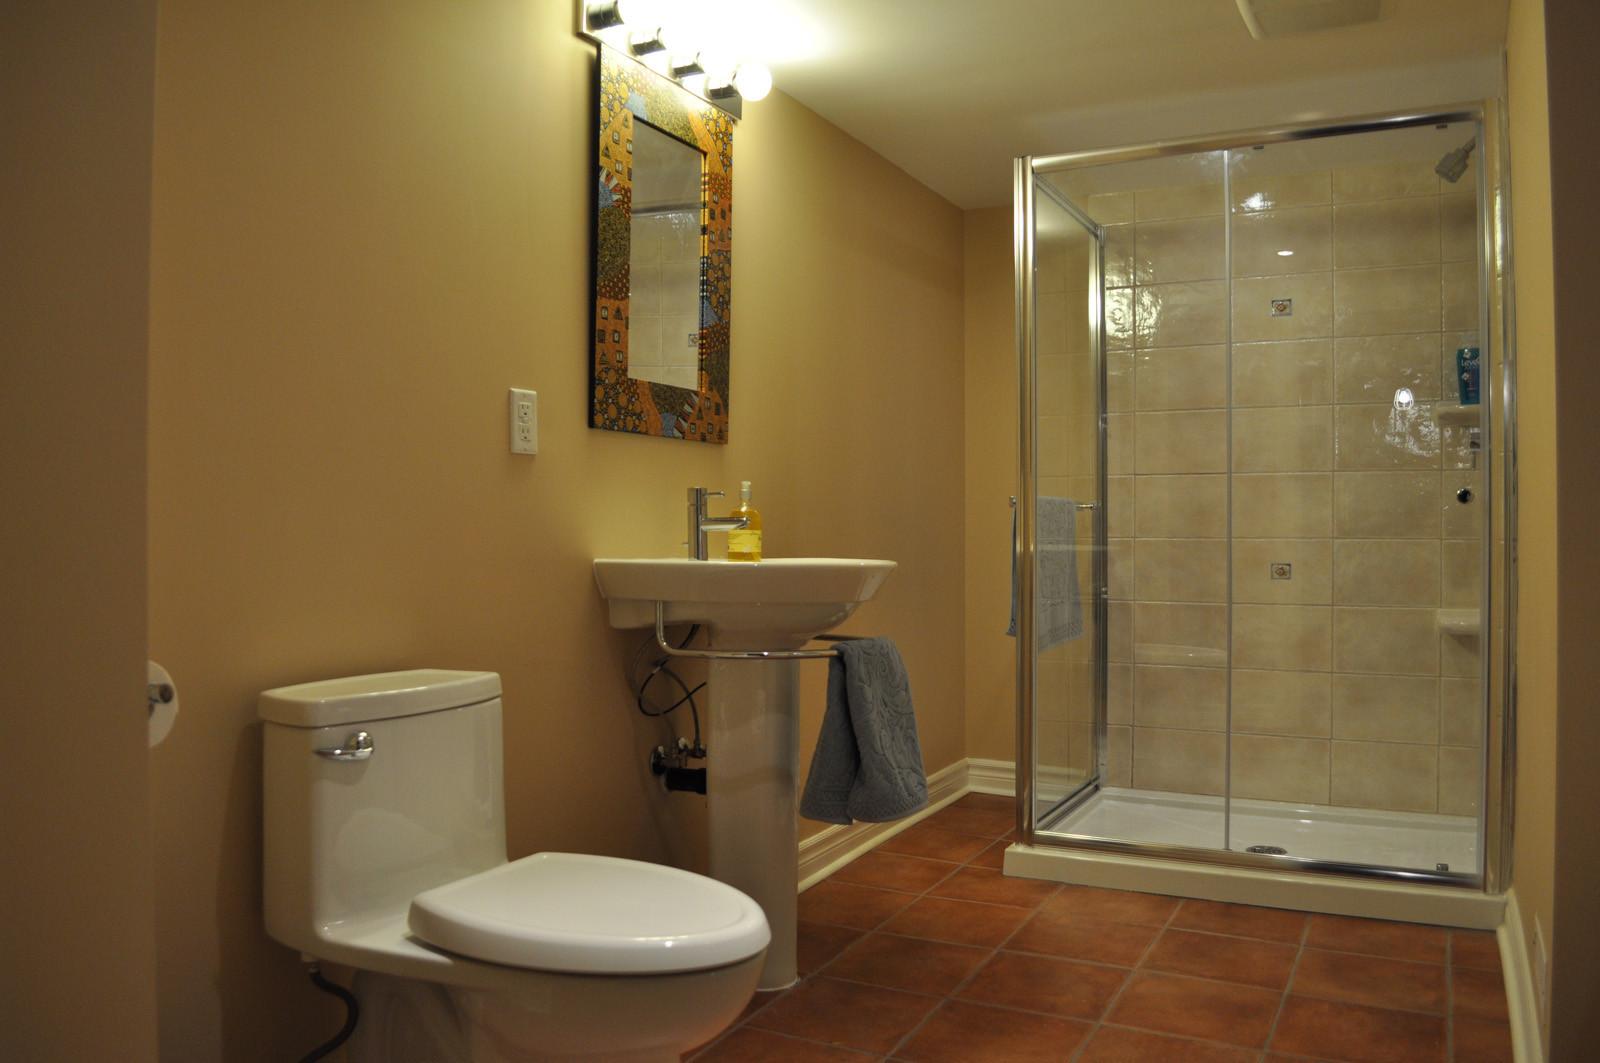 Basement Bathroom Design  Basement Bathroom Ideas for Attractive Looking Interior